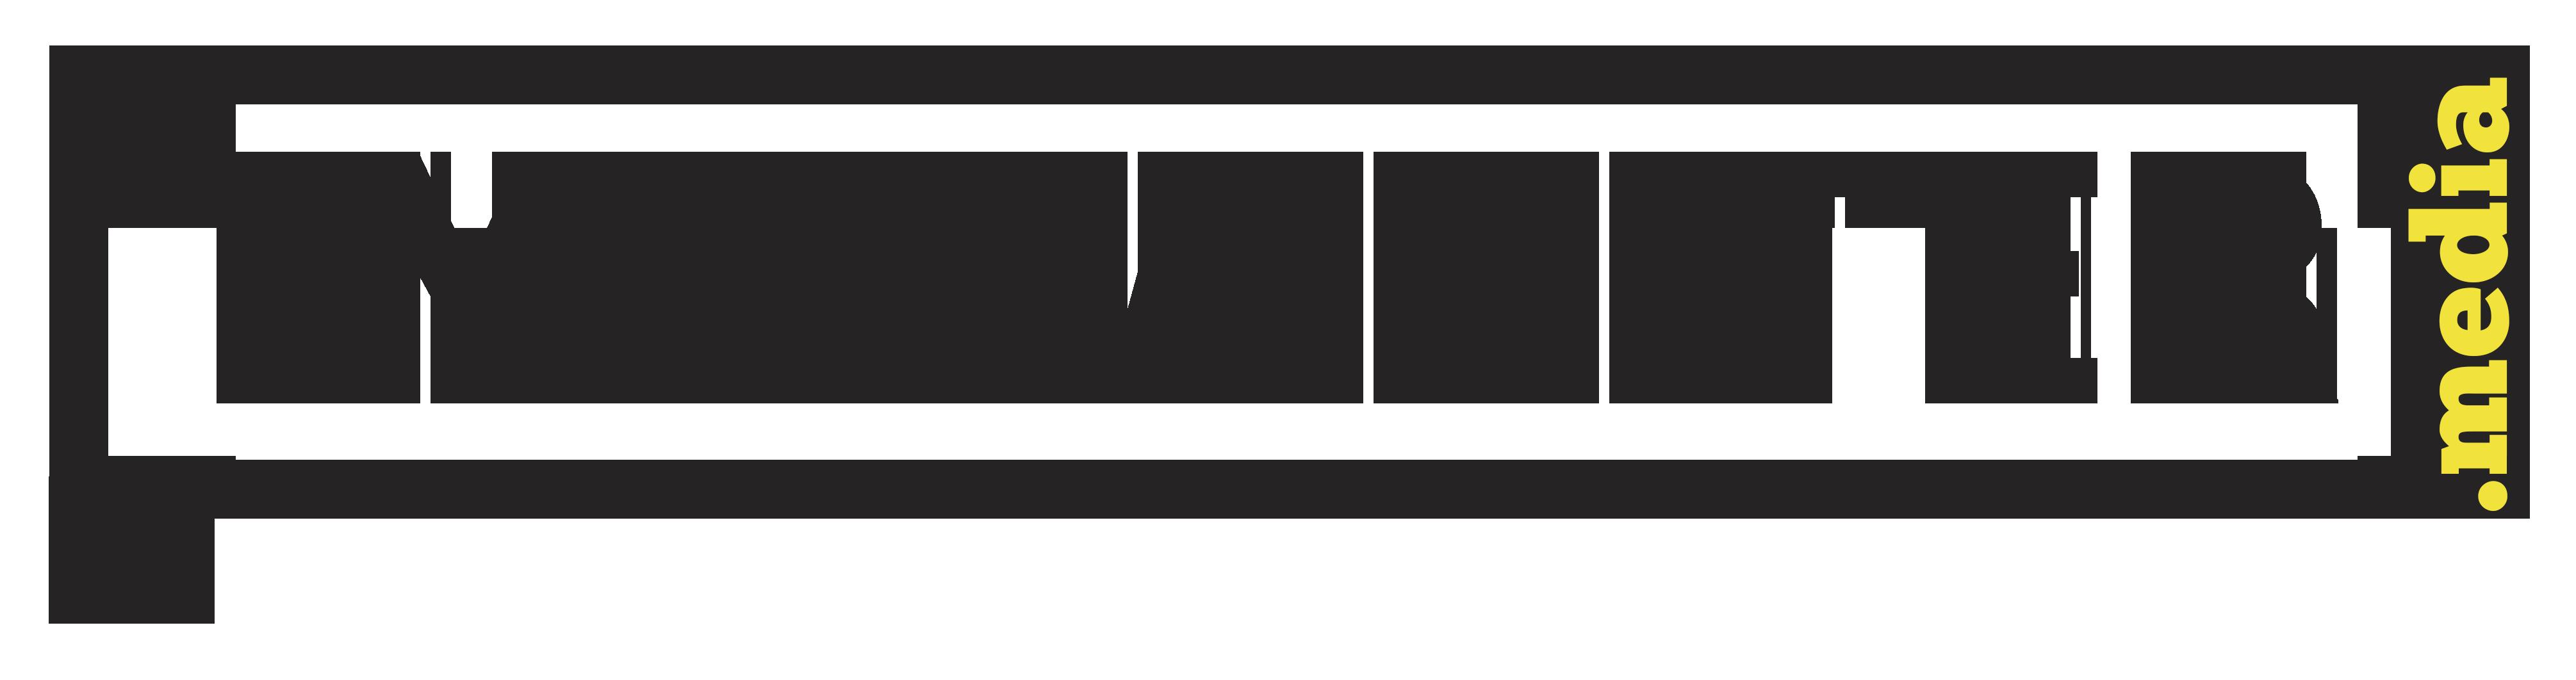 Typewriter.Media